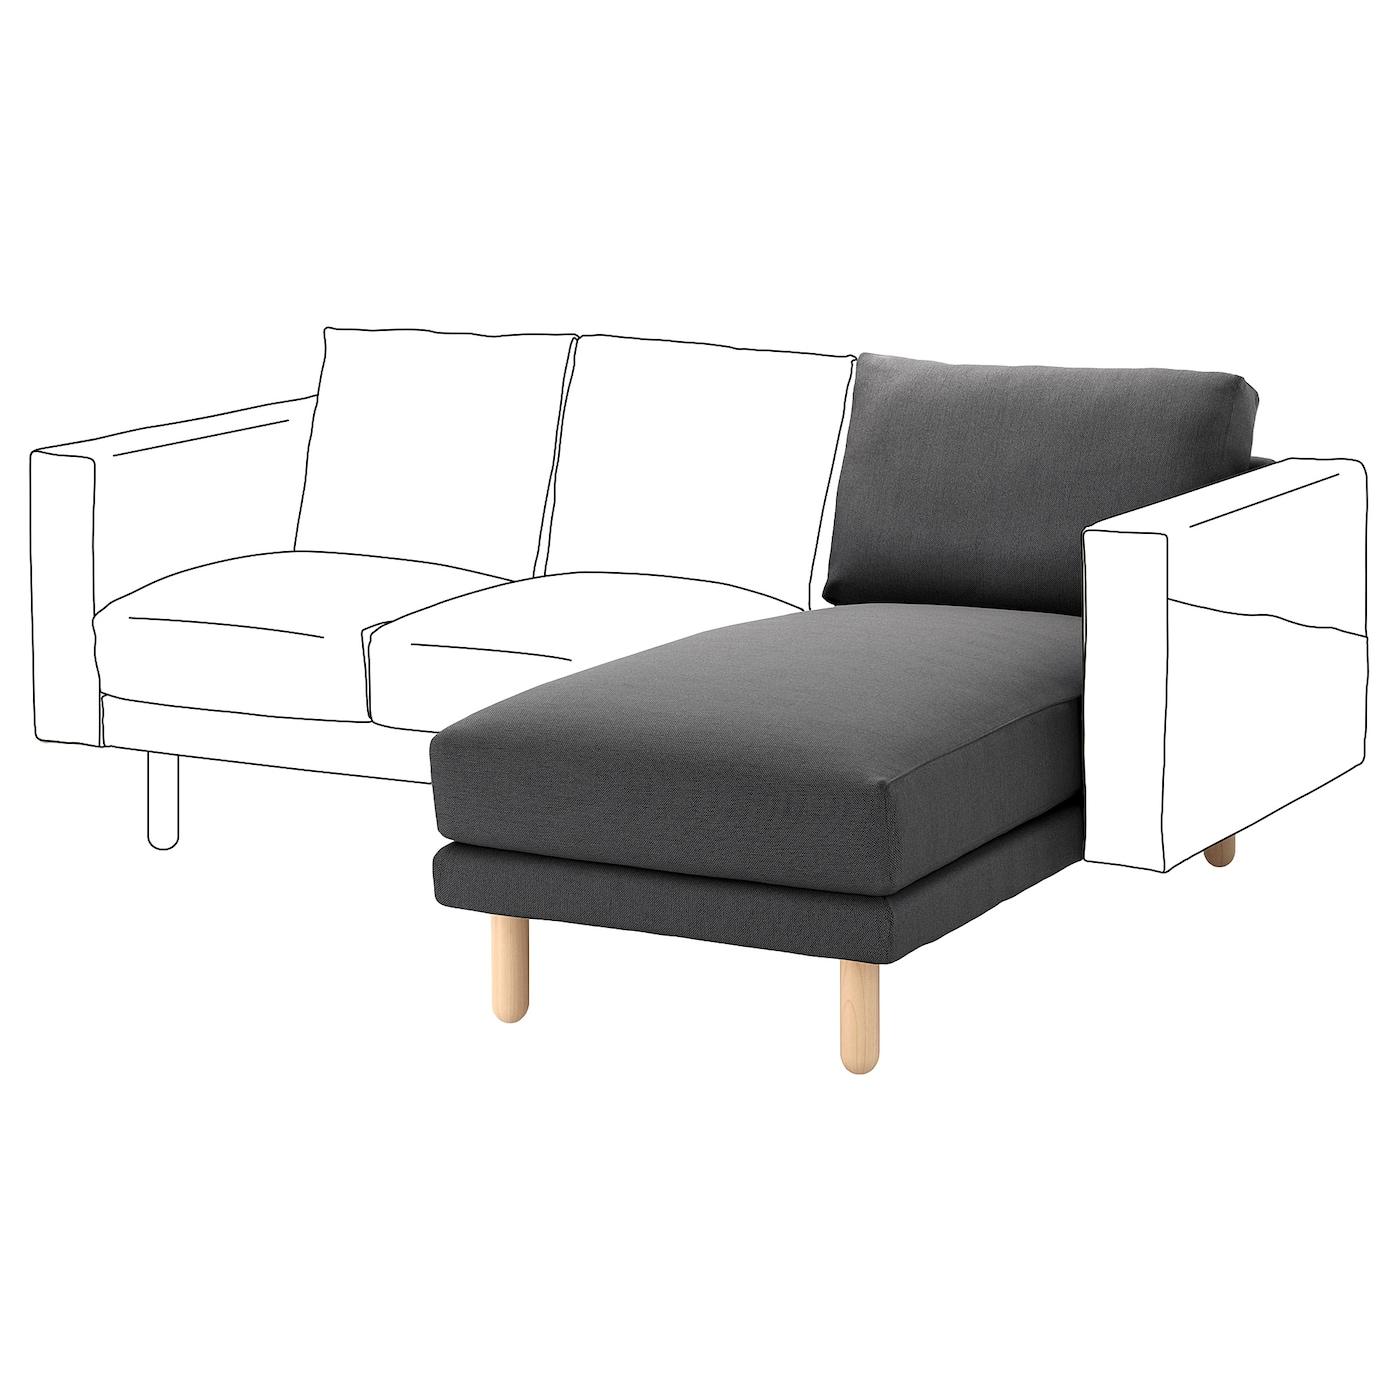 Norsborg chaise longue section finnsta dark grey birch ikea for Chaise longue rattan ikea